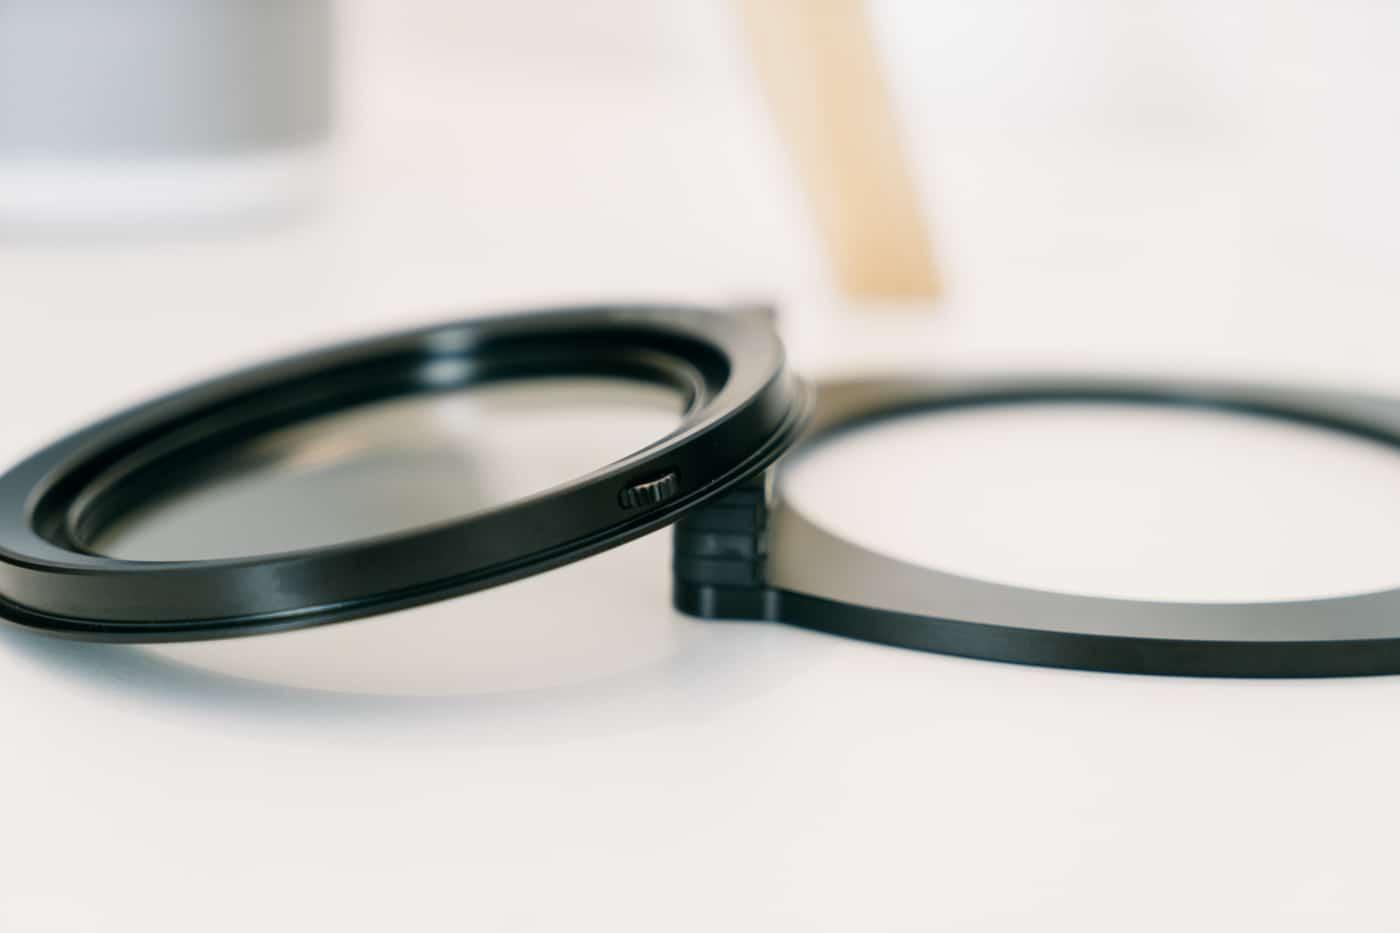 Test filtre NISI CPL NC Landscape (Intro)